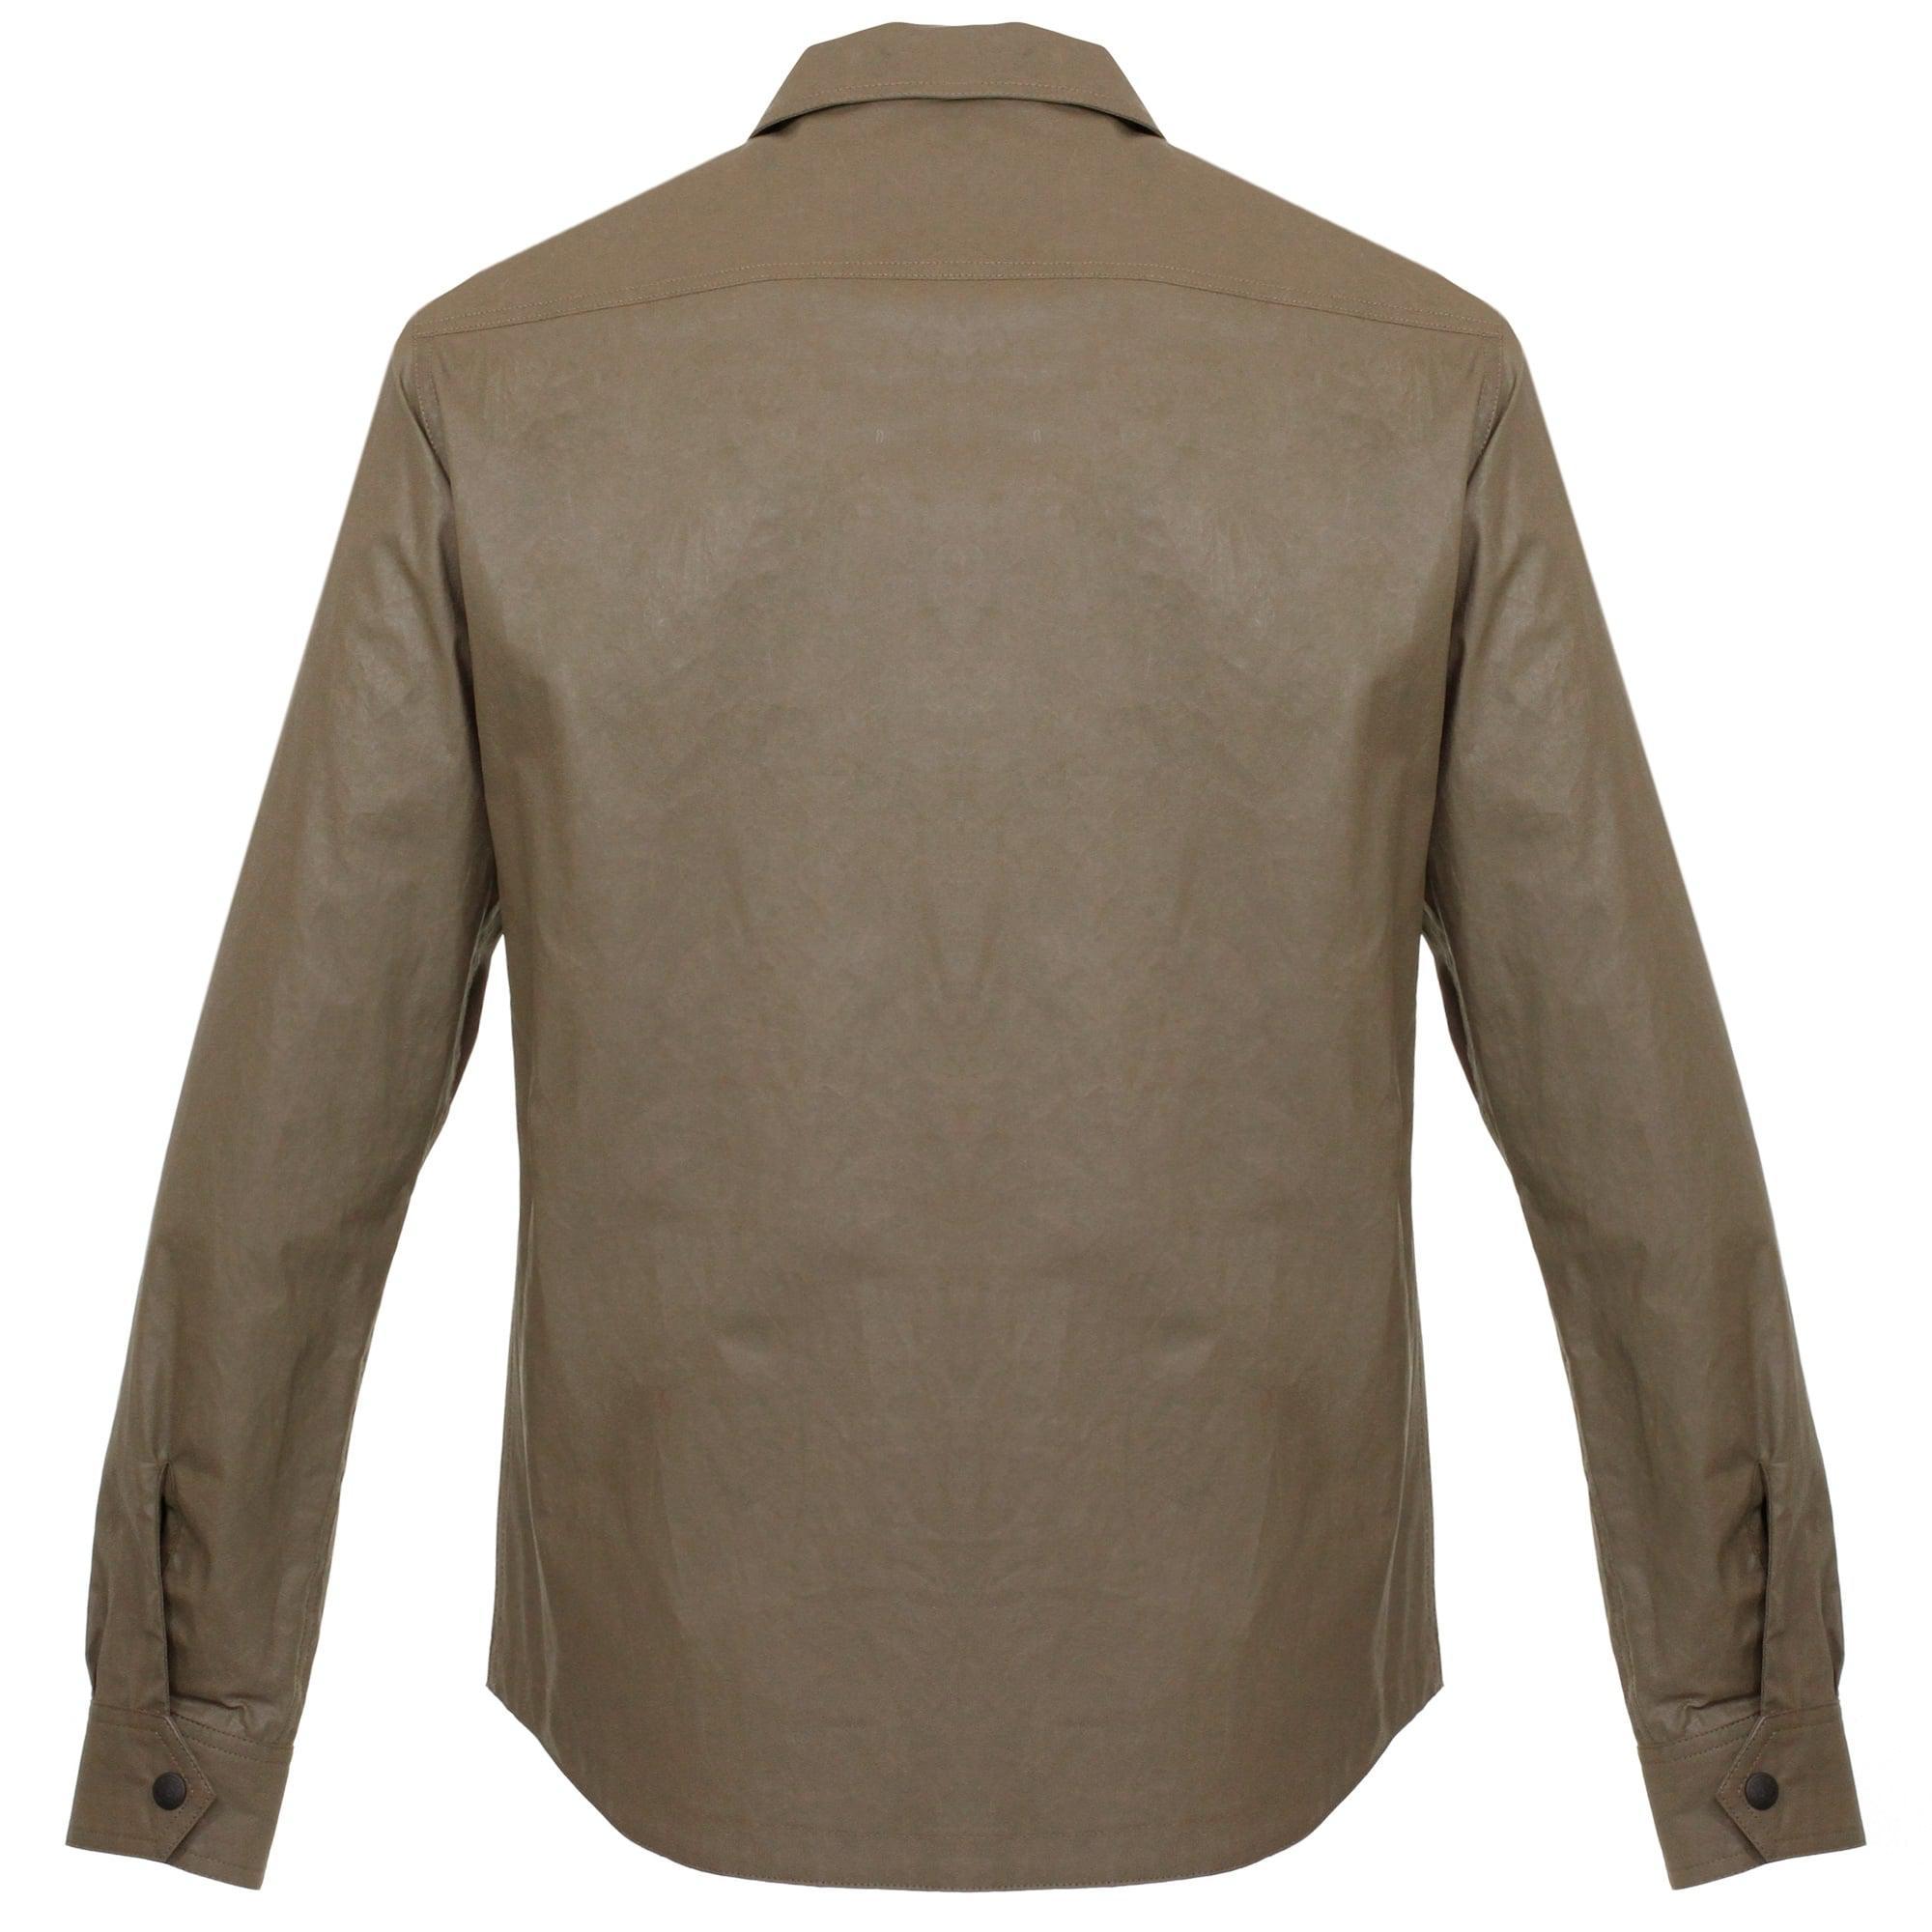 Barbour Sapper Jacket >> Belstaff Shawbury Dusty Military Green Short Jacket for Men - Lyst